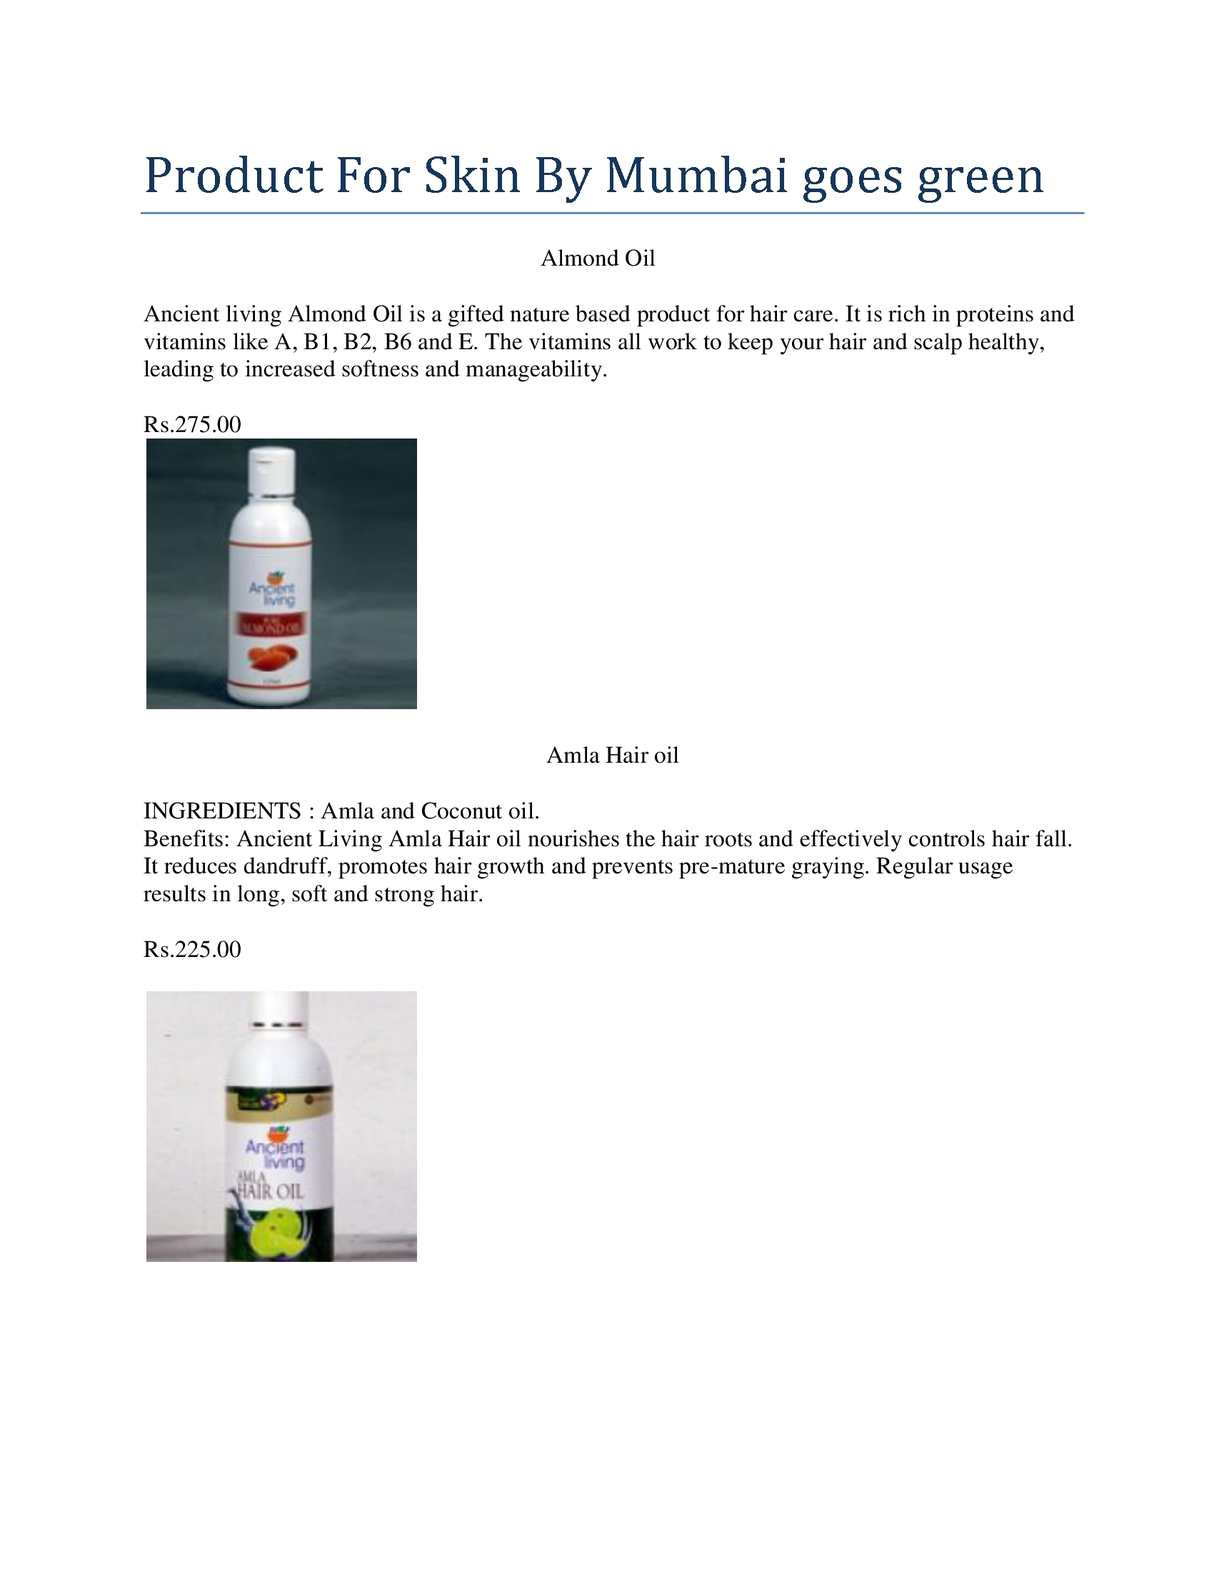 Calamo Product For Skin Mumbai Goes Green Kasturi Oil